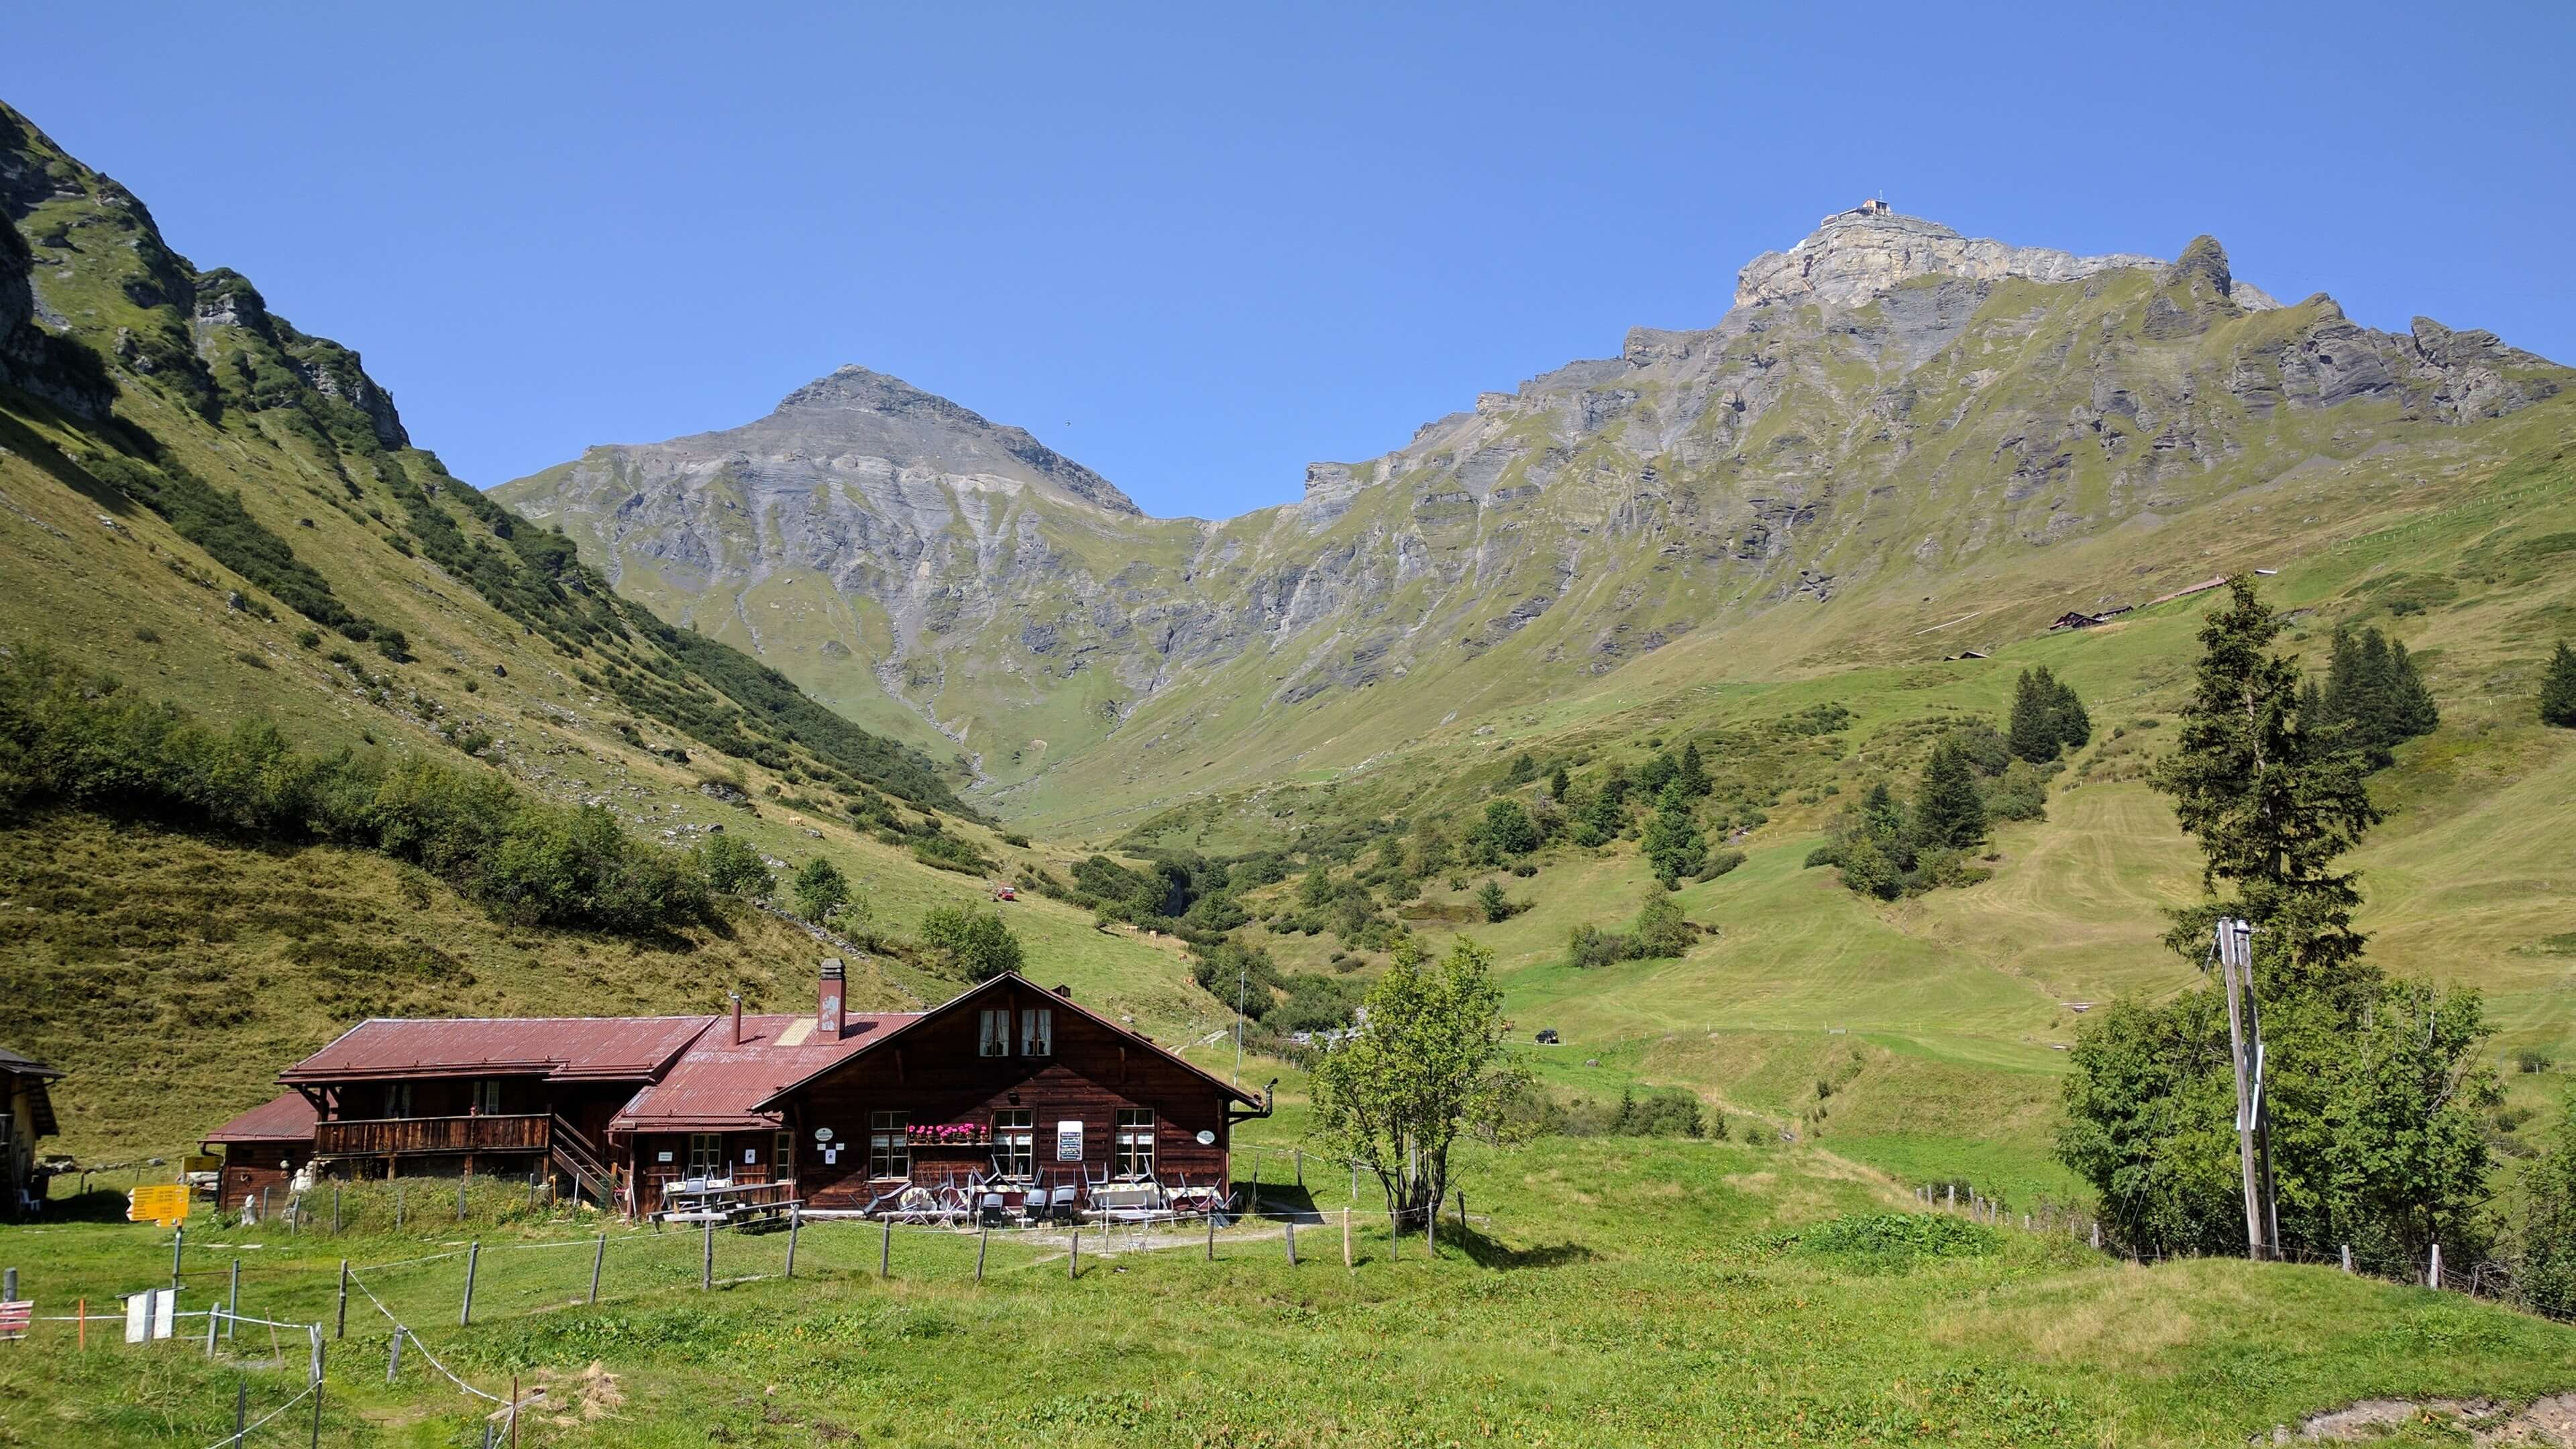 Stechelberg – Schilthorn (Piz Gloria)